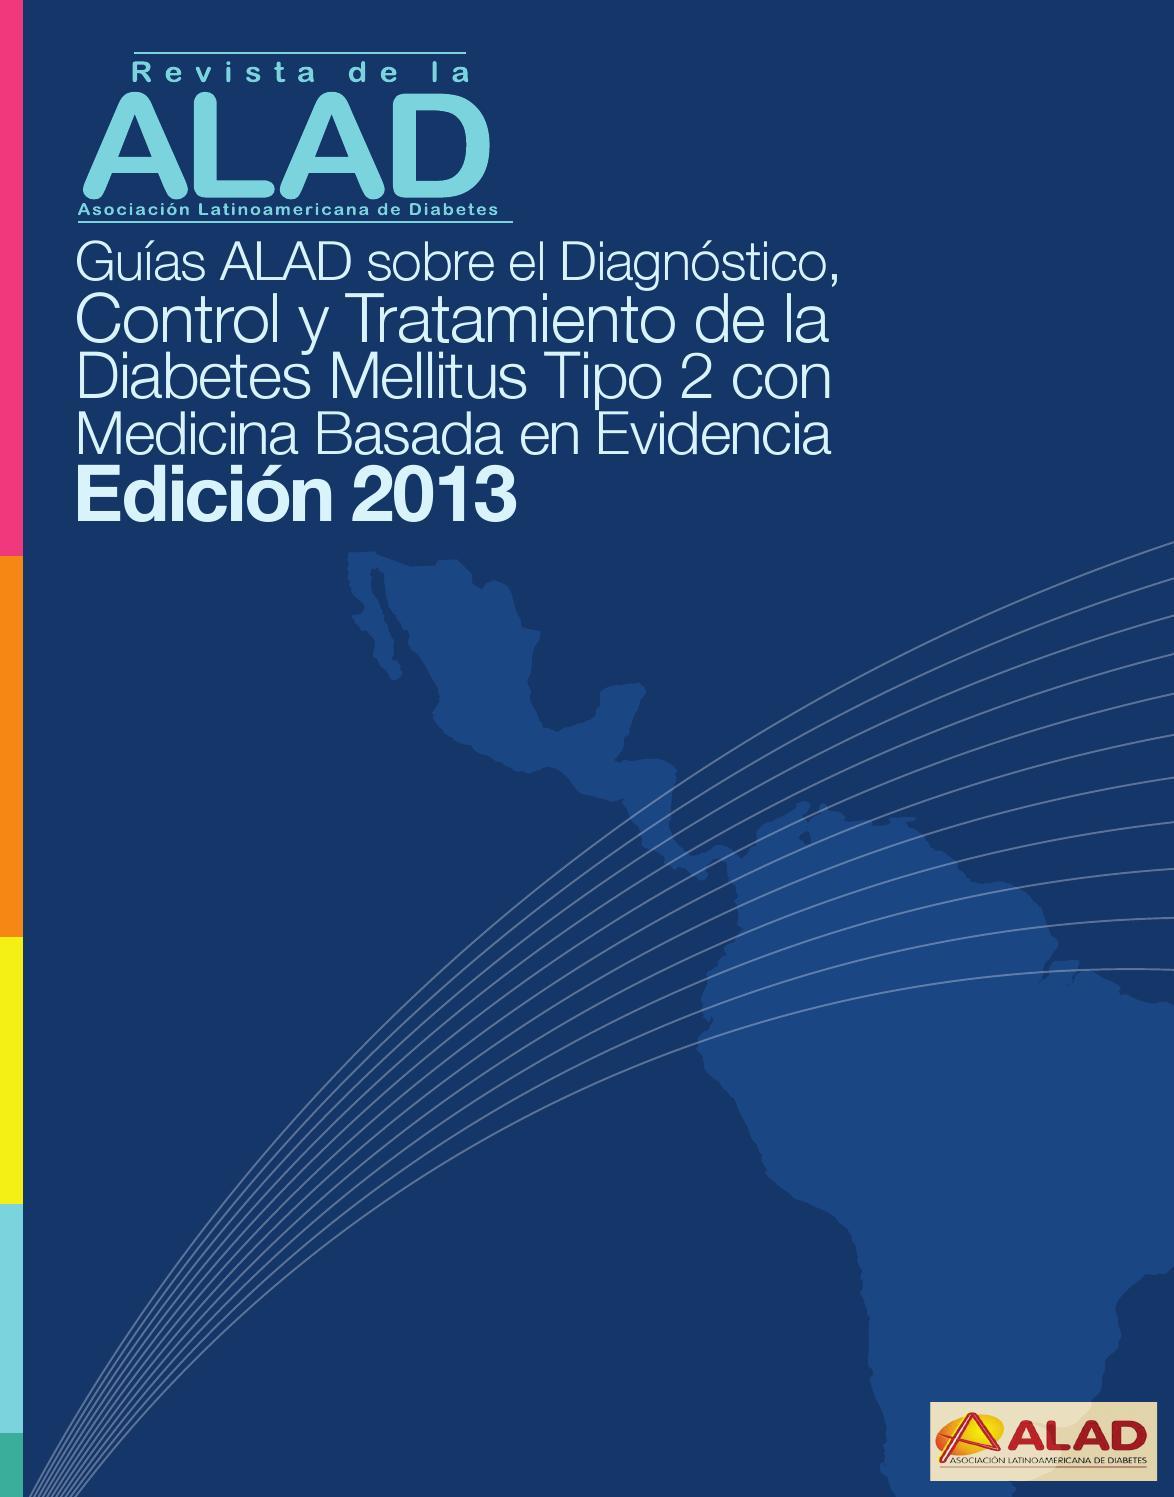 ISSUU - Guias alad 2013 by Asociacion Latinoamericana de